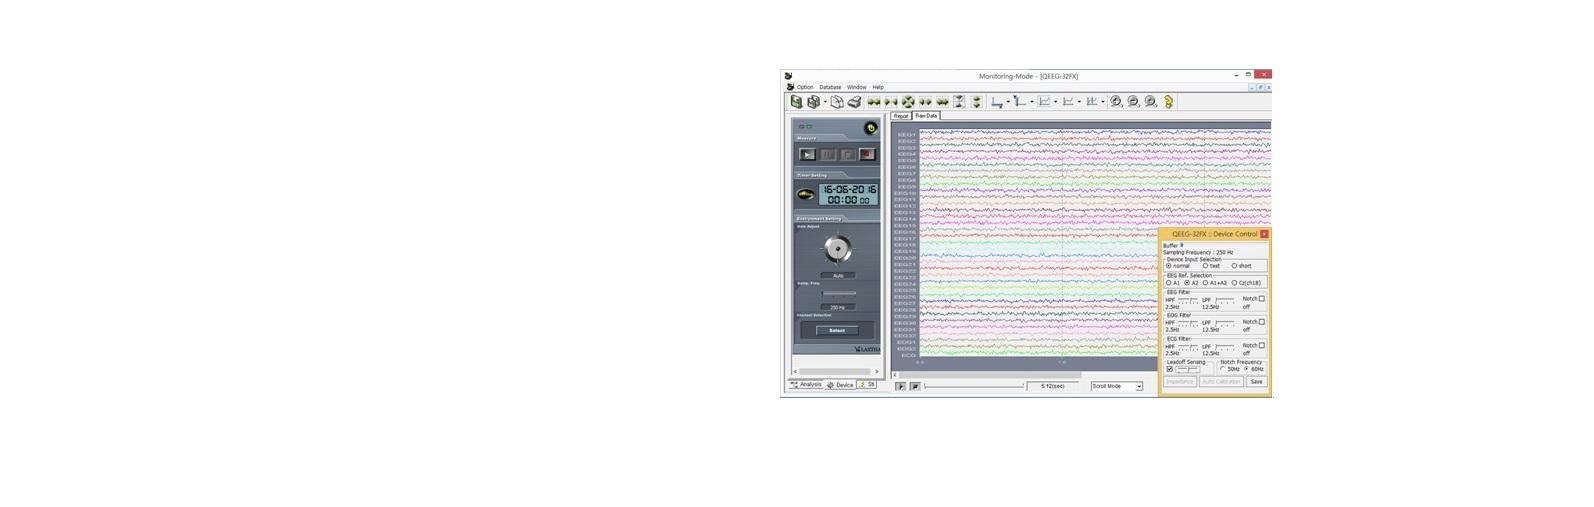 TeleScan_1594x507_5